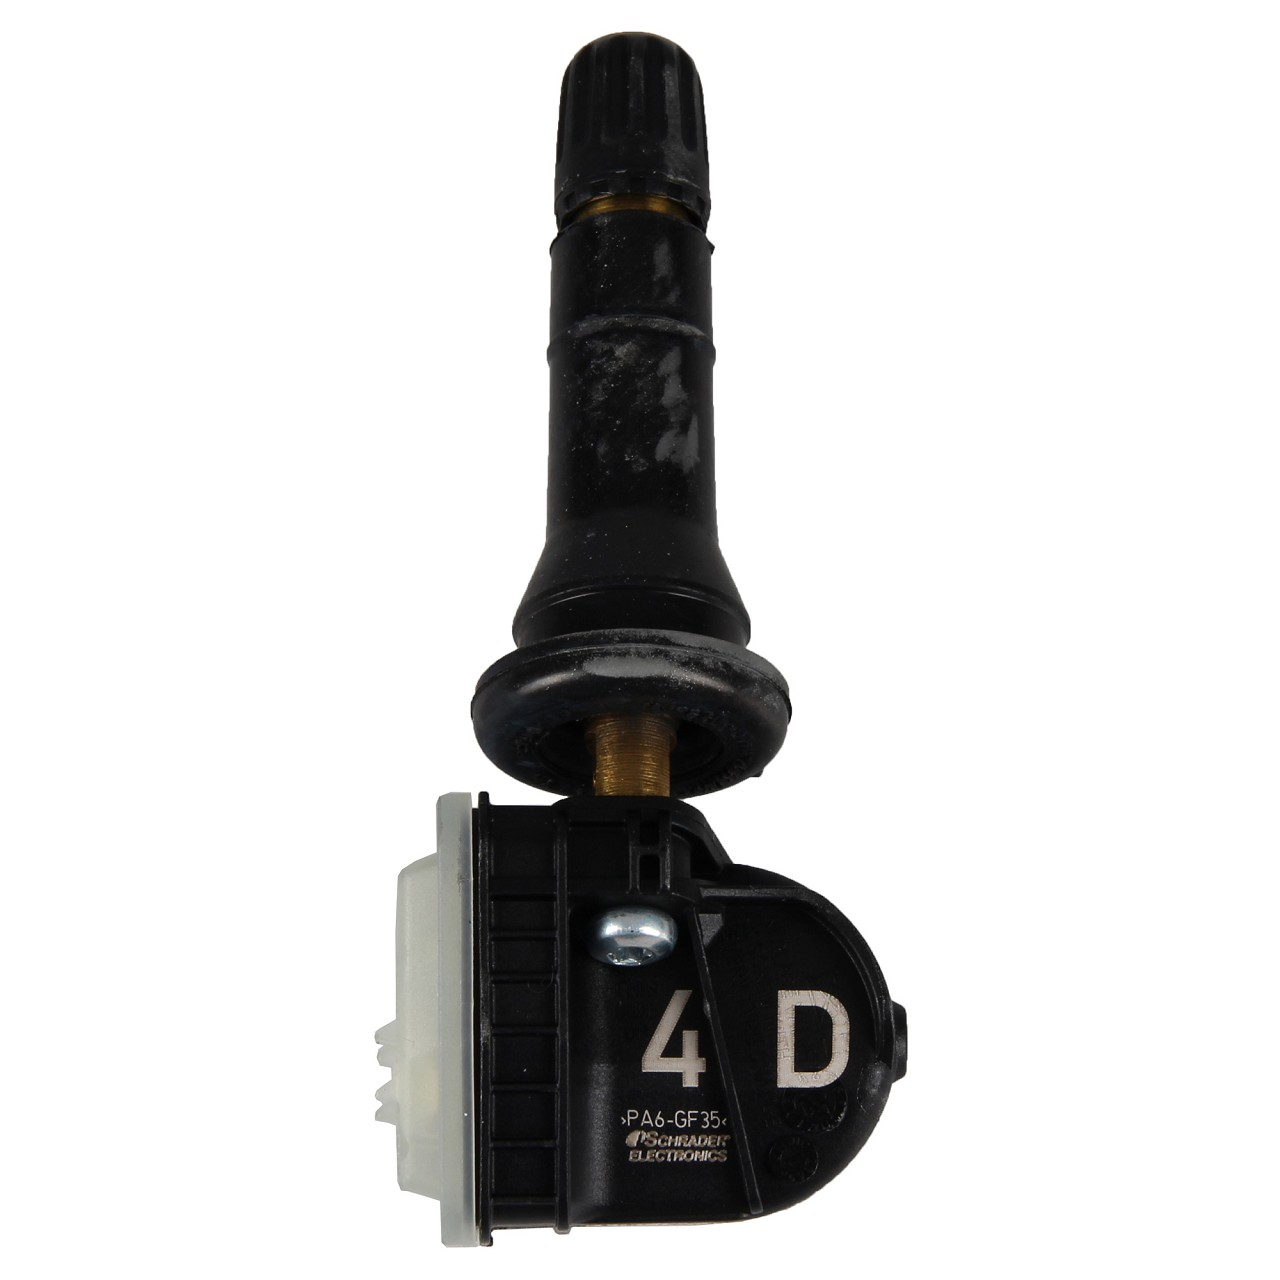 ORIGINAL Opel RDKS Reifendrucksensor Luftdrucksensor INSIGNIA B 13597645